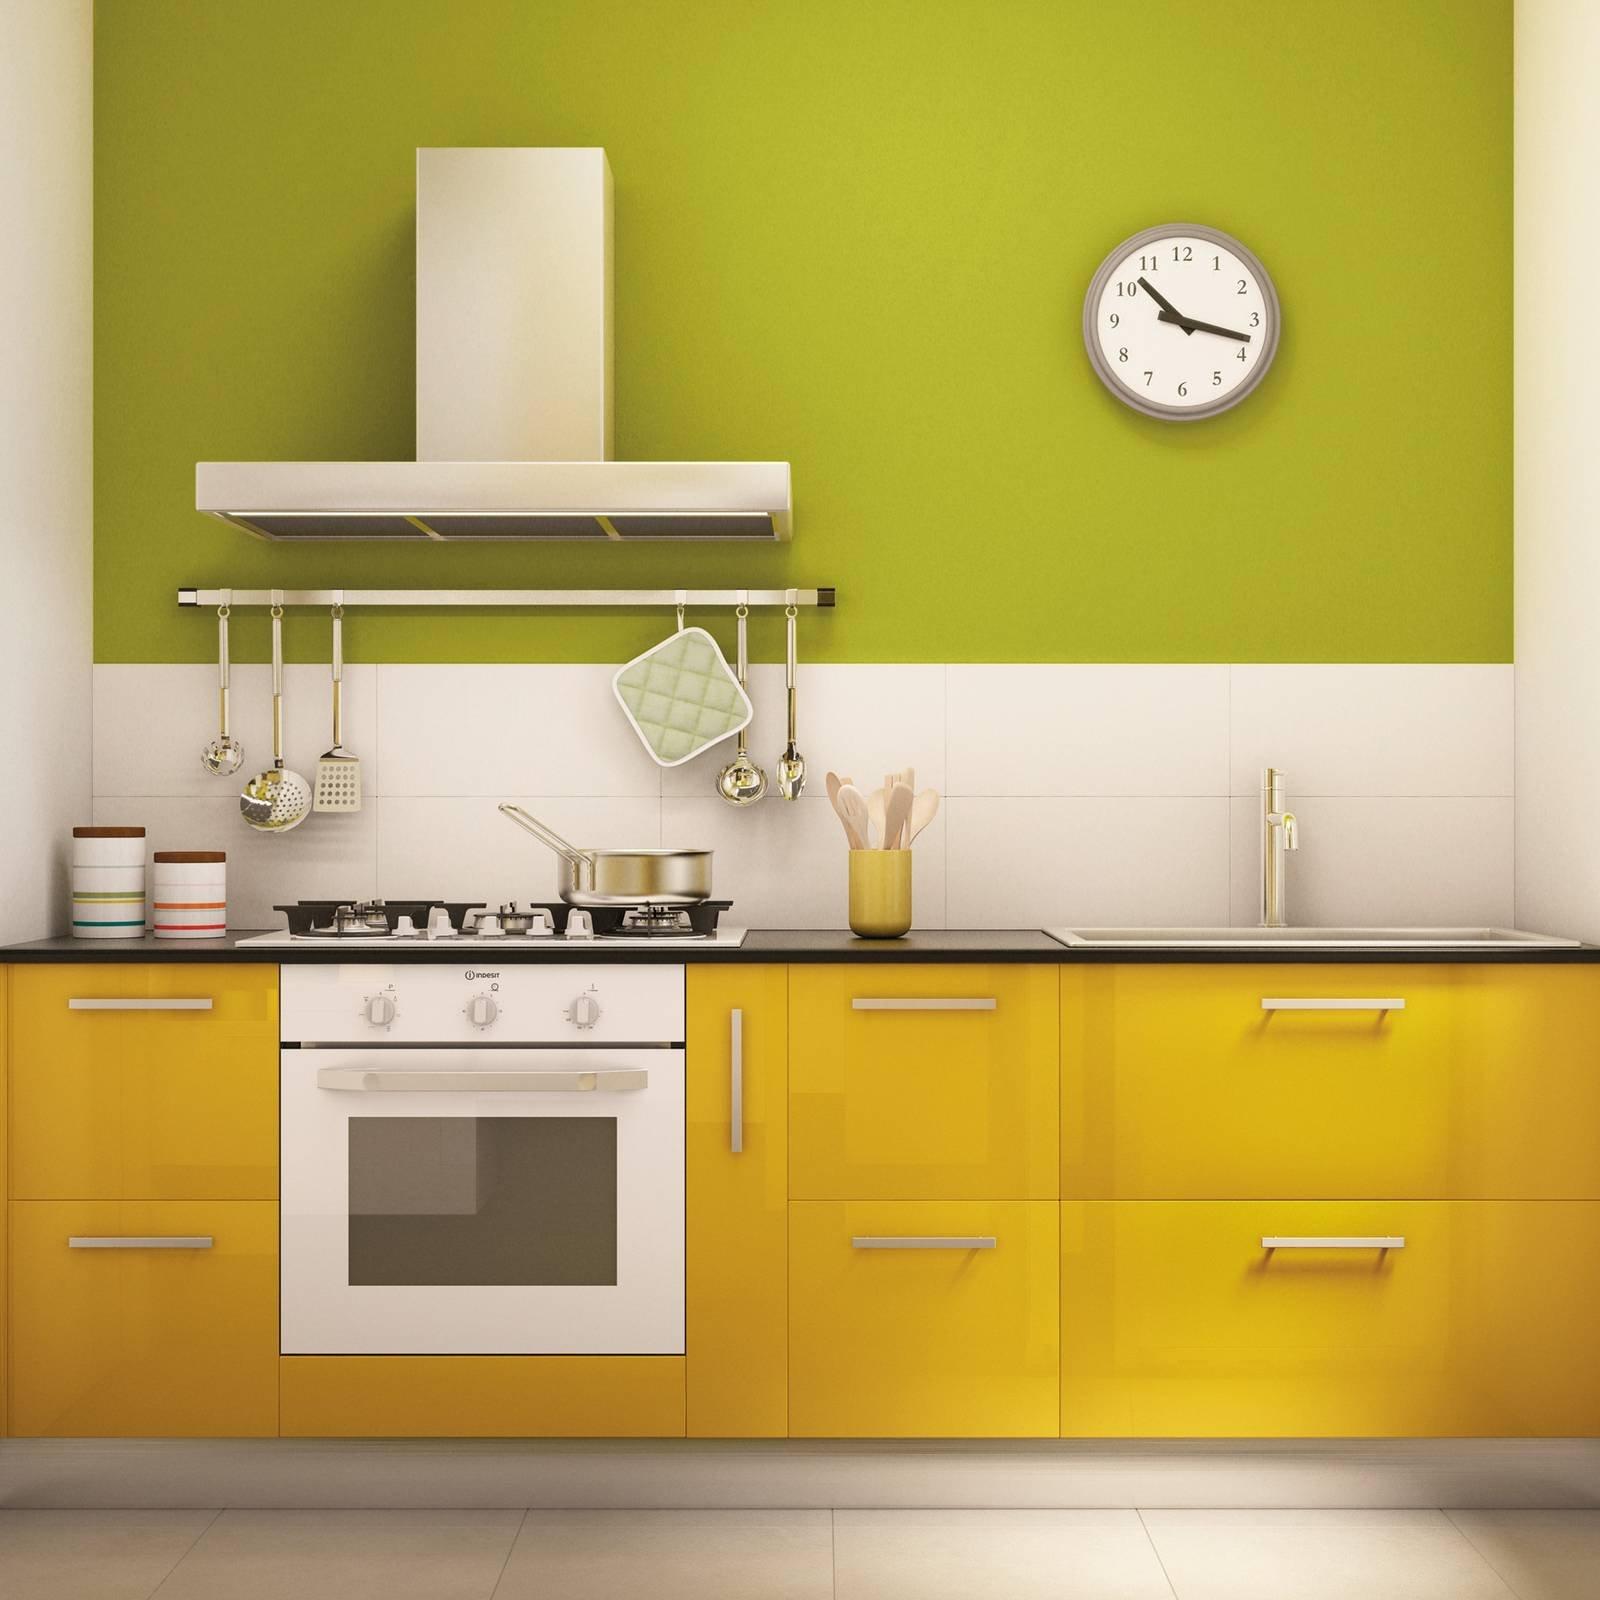 Cucina colorata 10 modelli supervivaci e moderni o sobri for Leroy merlin cucine